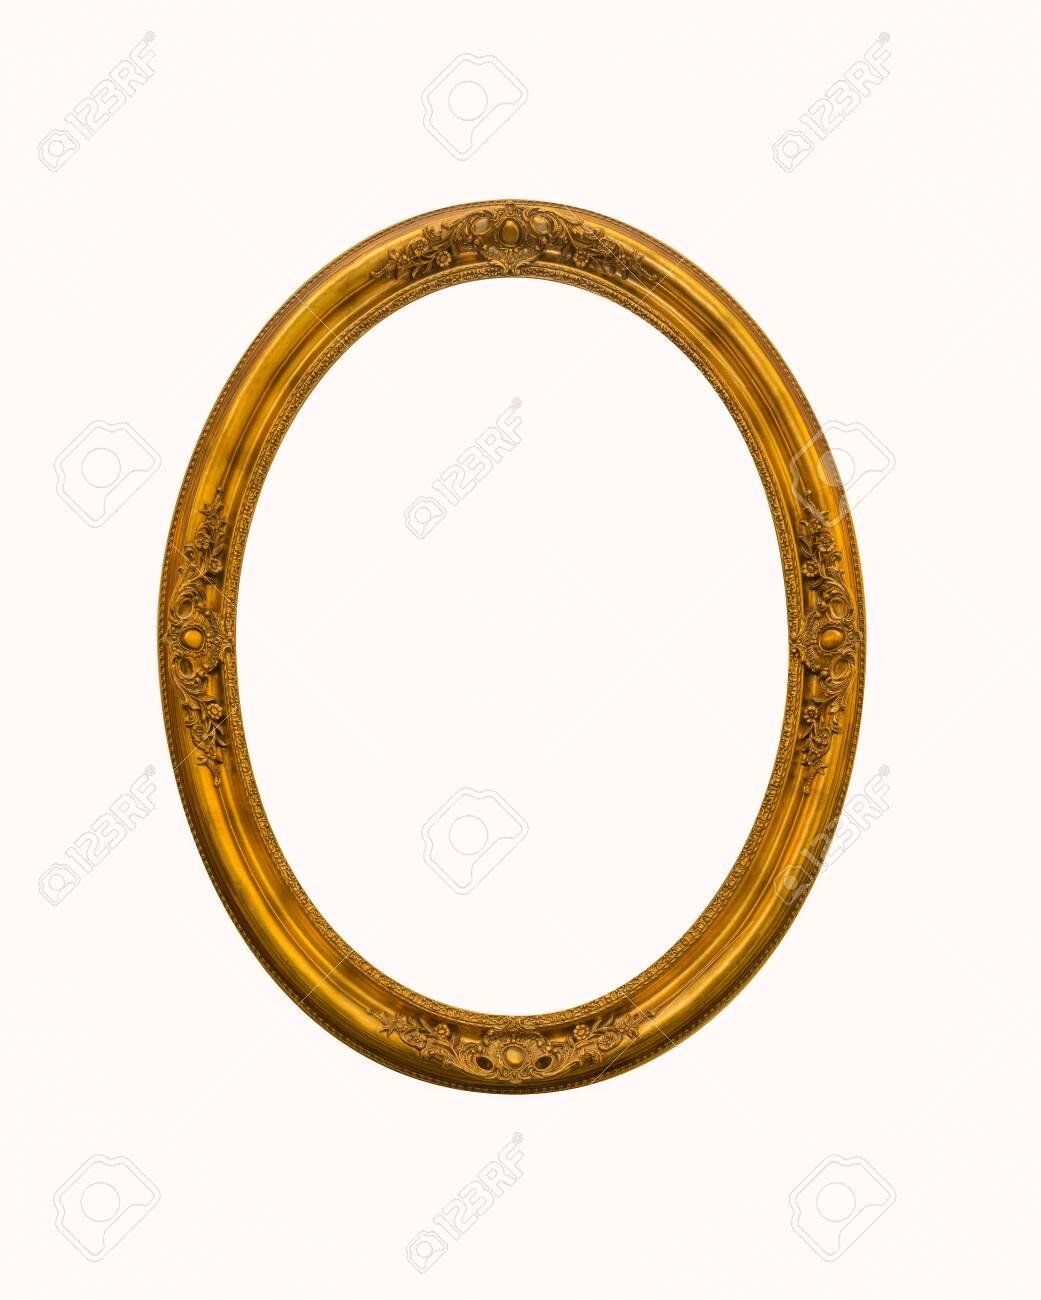 vintage gold oval frames or photo frame elegant isolated on white background. - 152343471